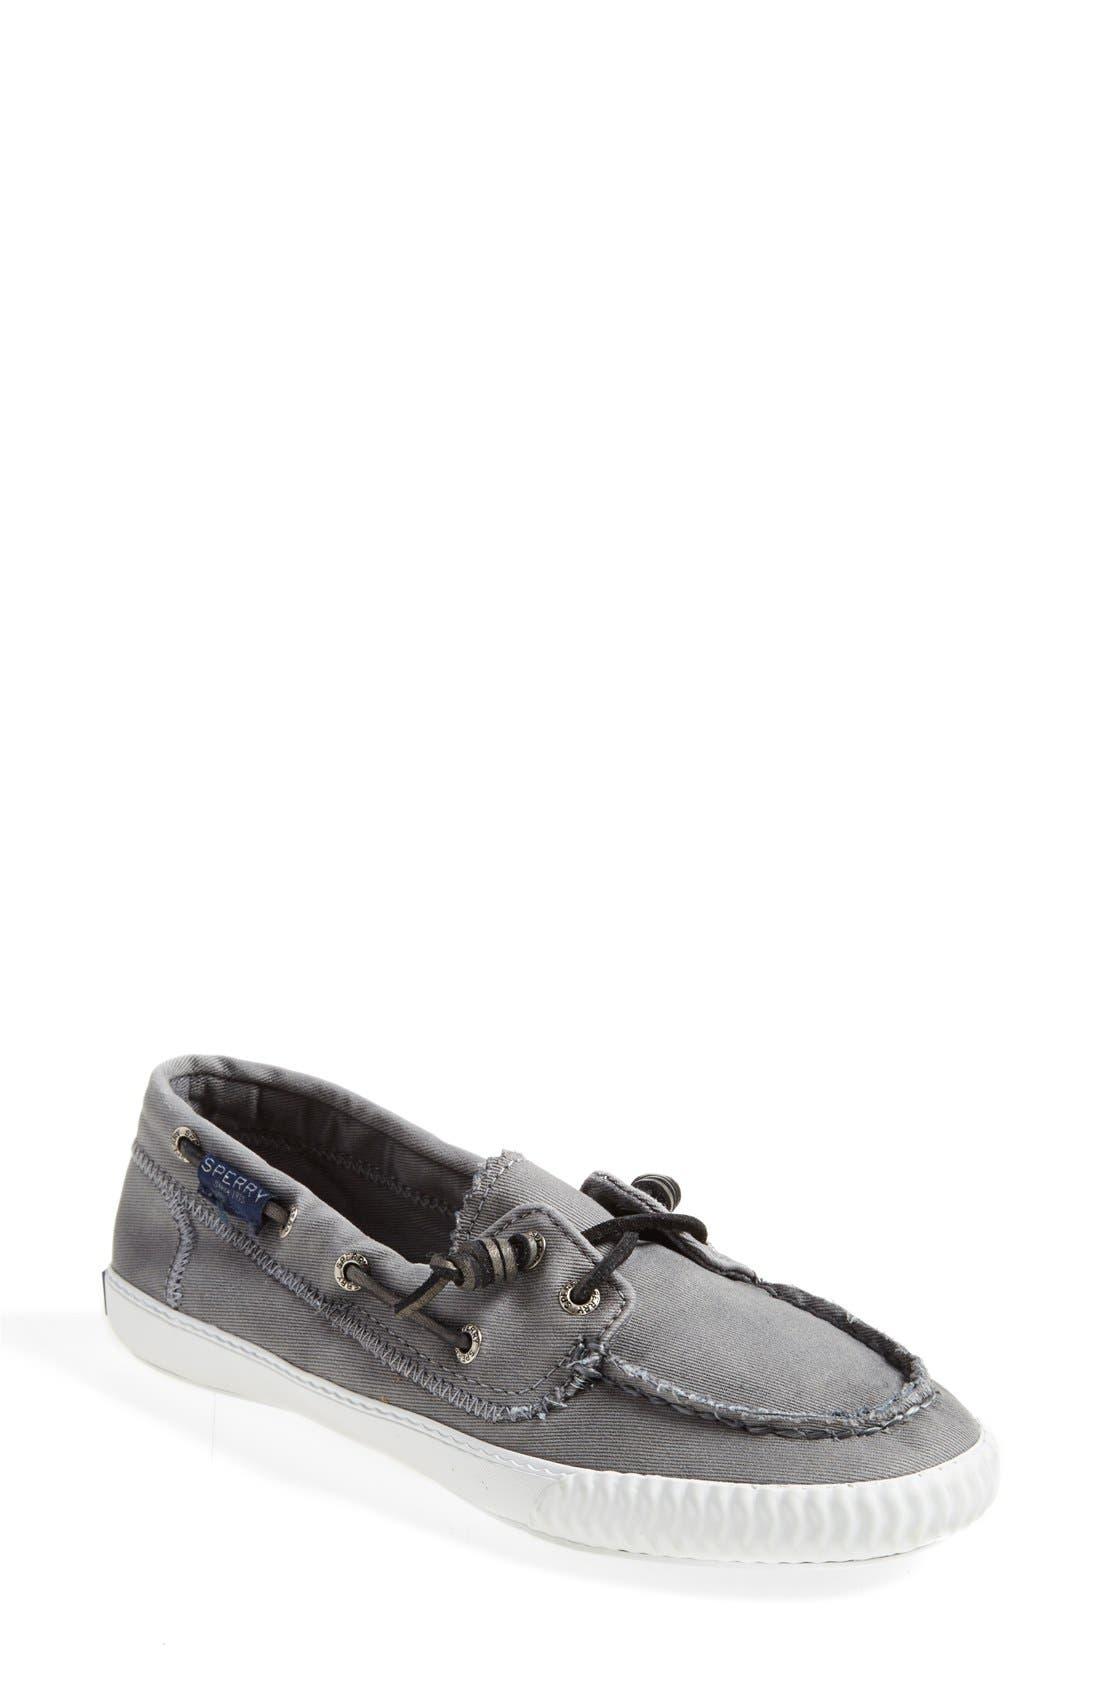 Paul Sperry 'Sayel Away' Sneaker,                             Main thumbnail 1, color,                             GREY